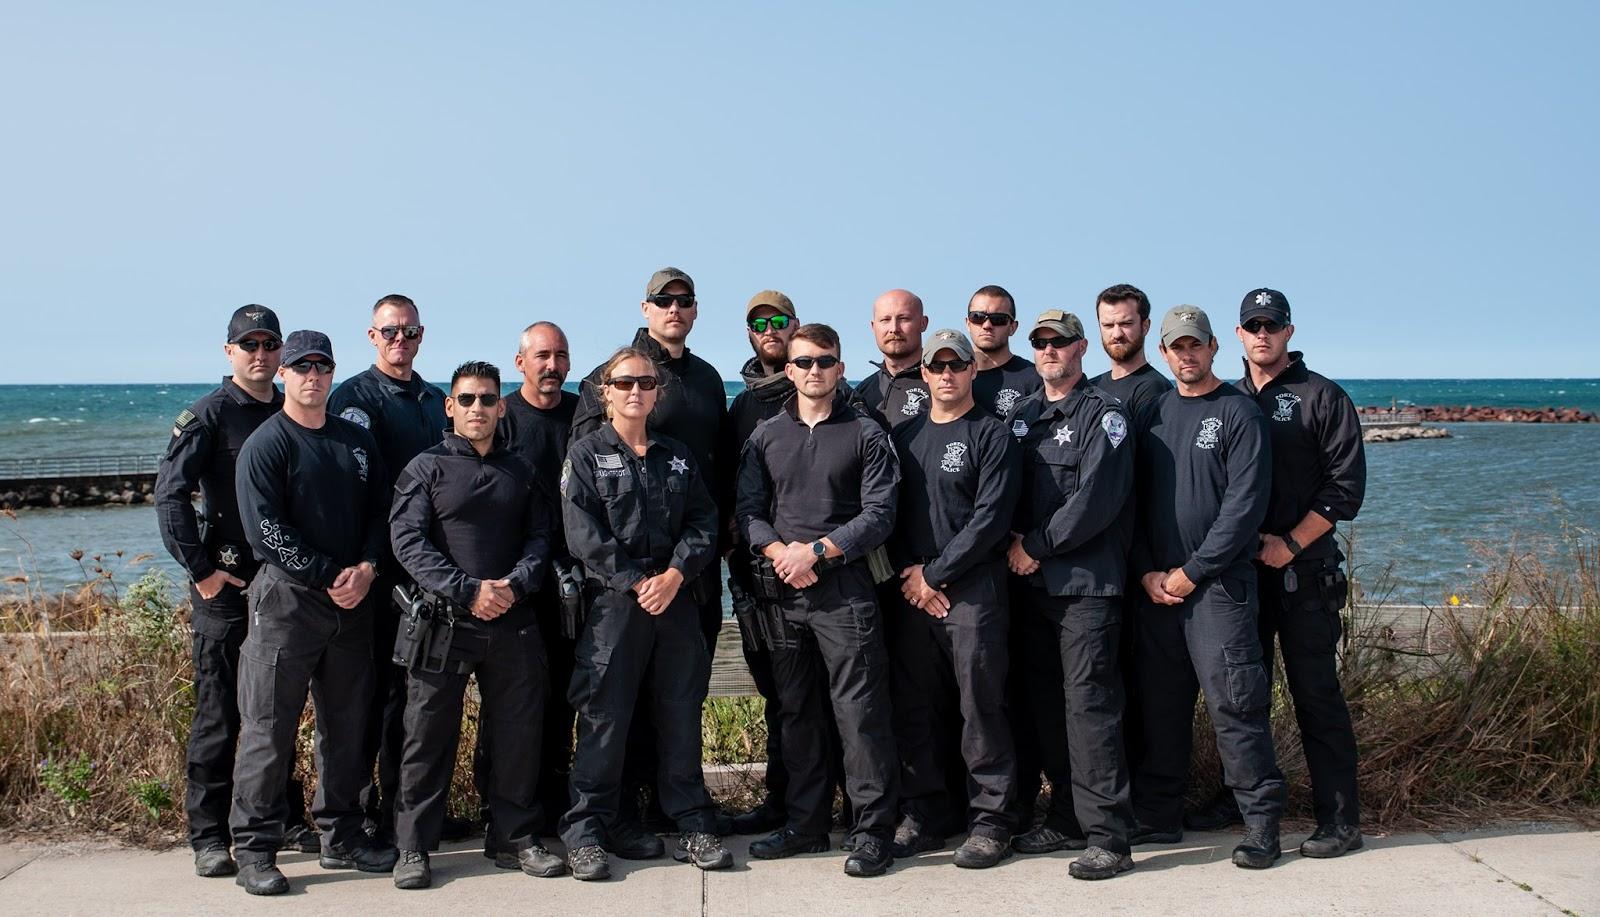 Portage Police Department SWAT team